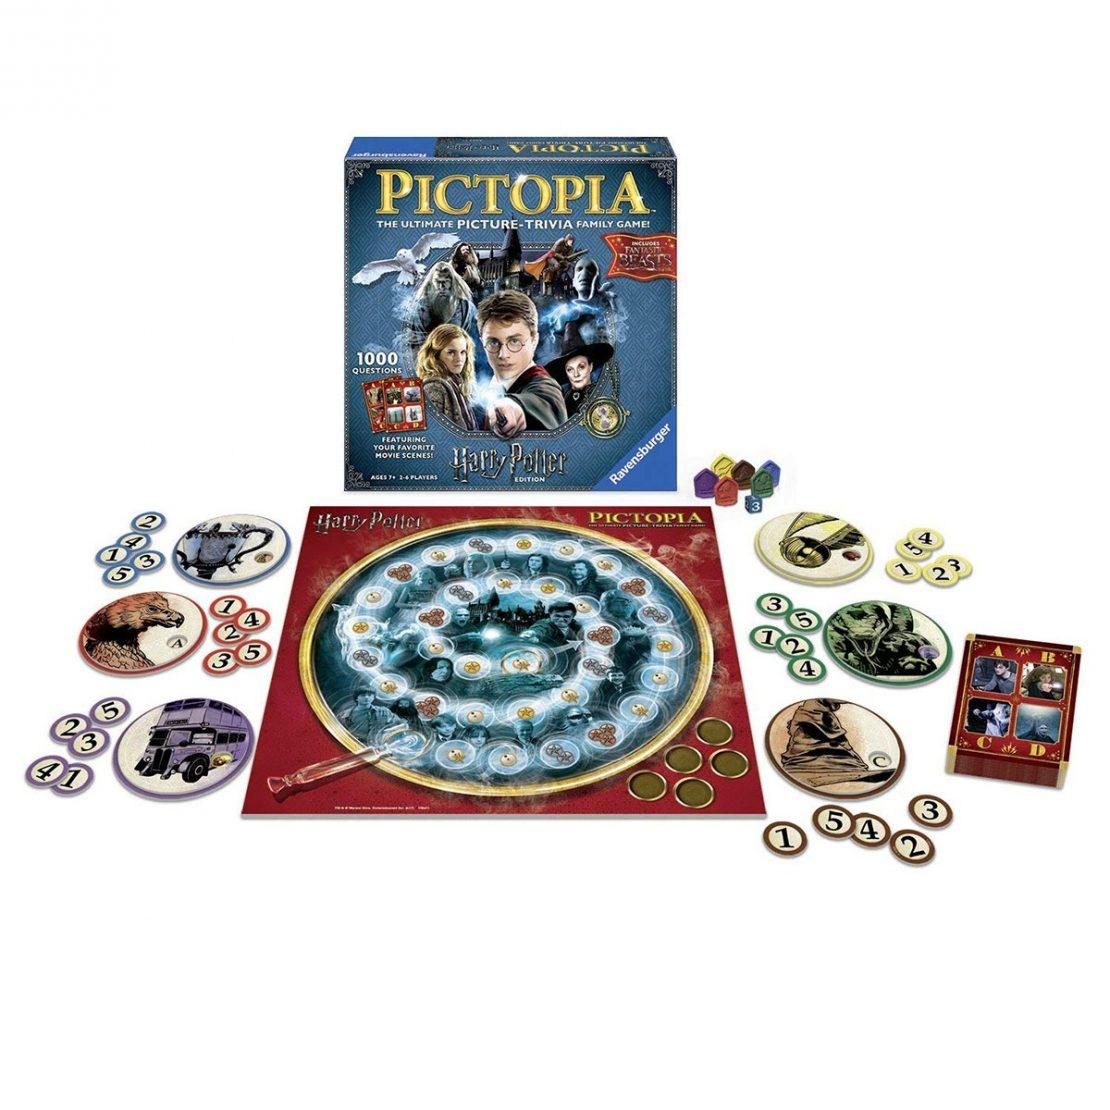 Harry Potter Pictopia Contents